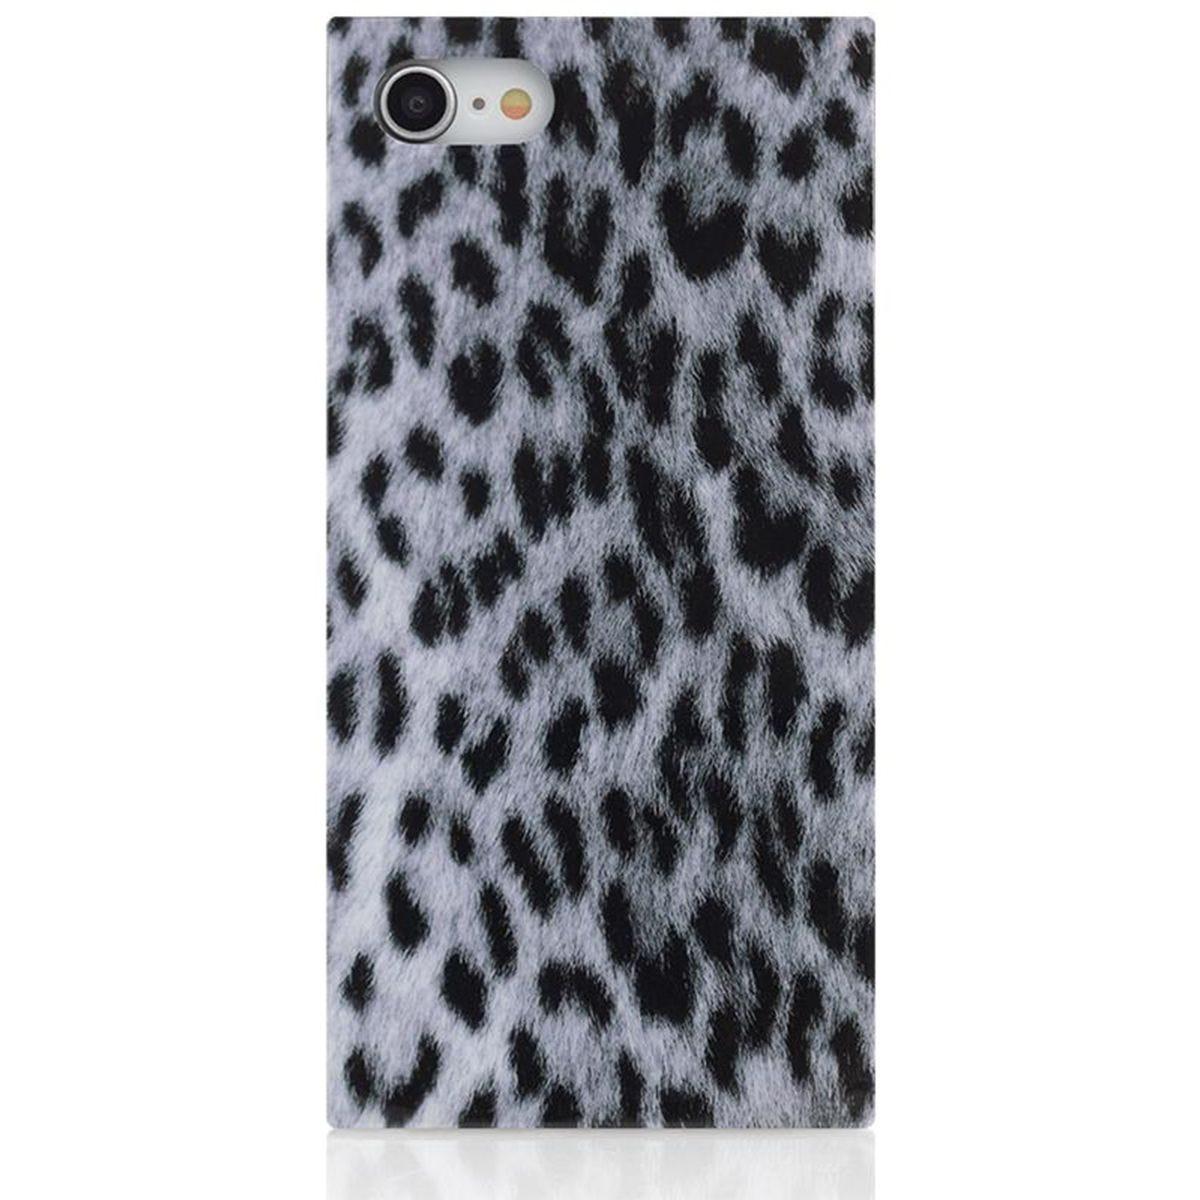 iDecoz Snow Leopard Phone Case iPhone X/XS